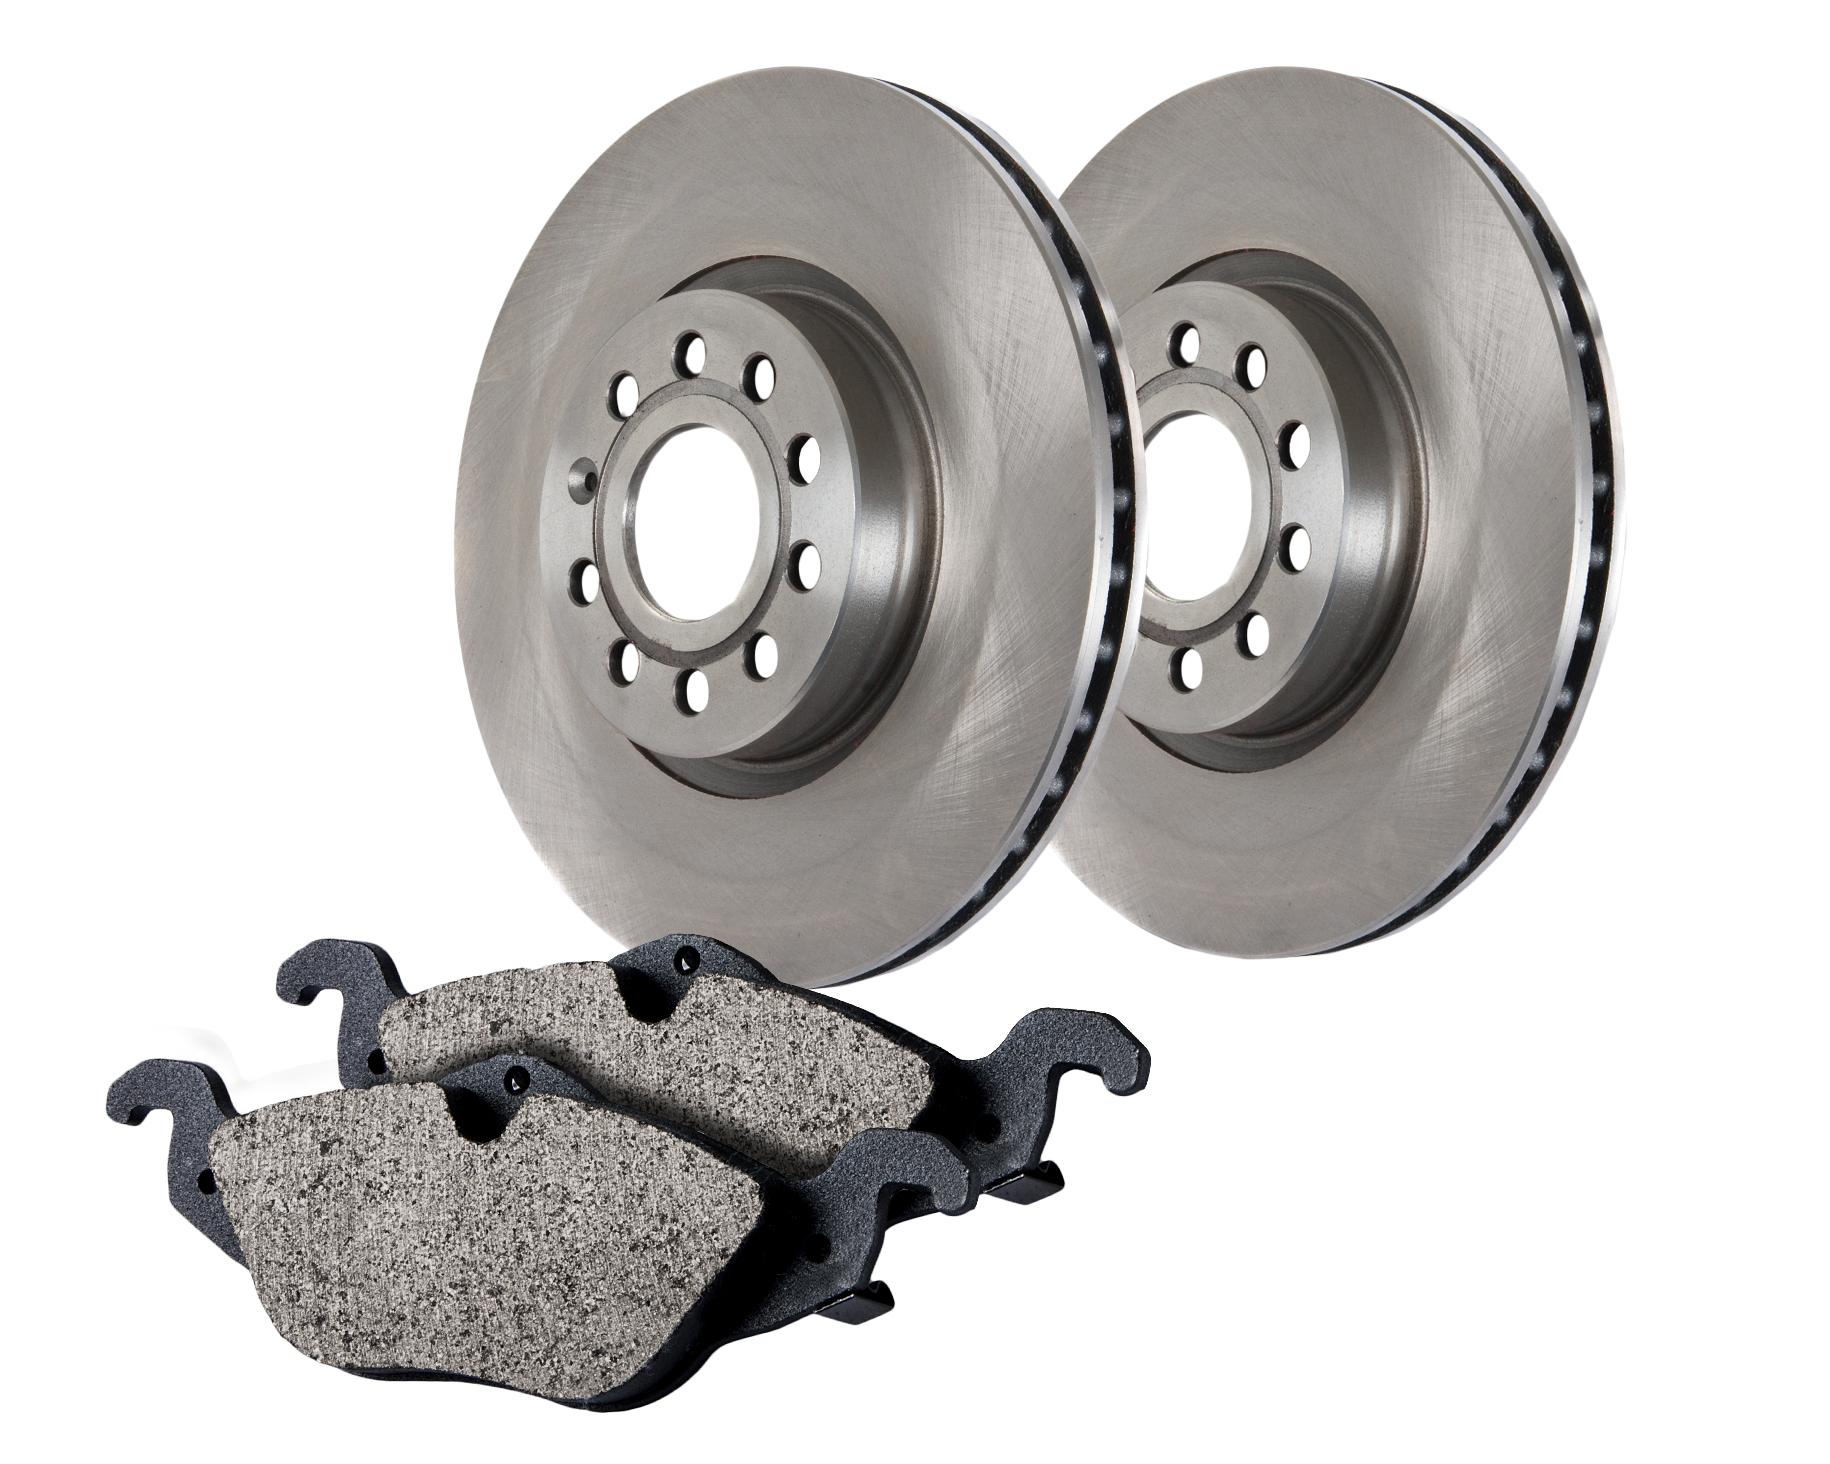 Centric Brake Parts 905.67004 Brake Rotor and Pad Kit, Premium, Semi-Metallic Pads, Iron, Natural, Mopar Minivan 2012-16, Kit